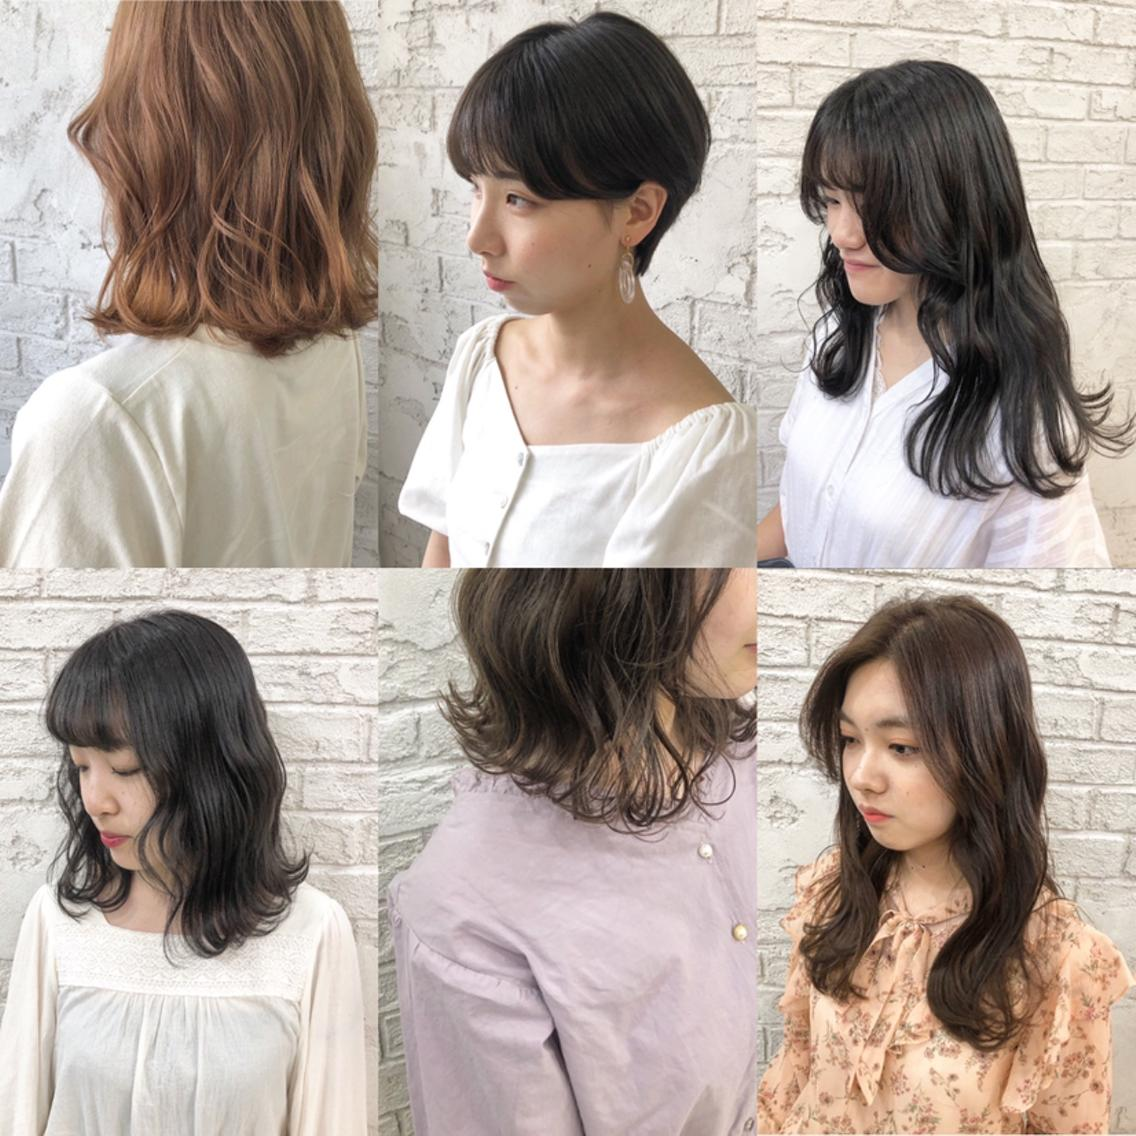 prize池袋西口店所属・♡シールエクステ♡ harukaの掲載